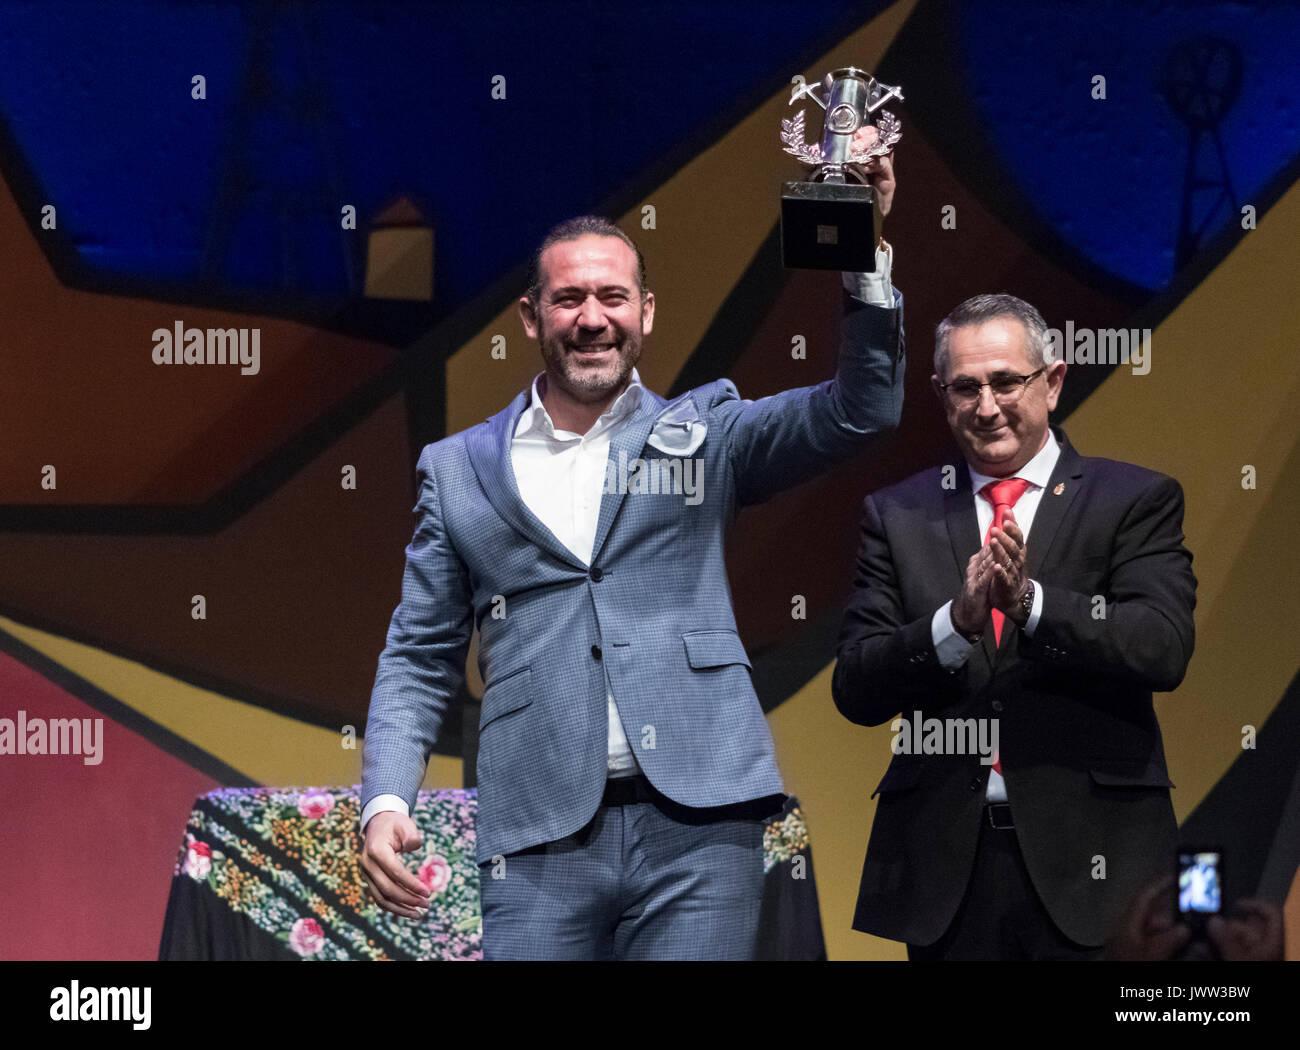 La Unión, Spain. 12th August, 2017. Flamenco singer, Alfredo Tejada Zurita, wins the Lampara Minera trophy at the final of the 'Cante de las Minas' International Flamenco Festival. Credit: ABEL F. ROS/Alamy Live News - Stock Image